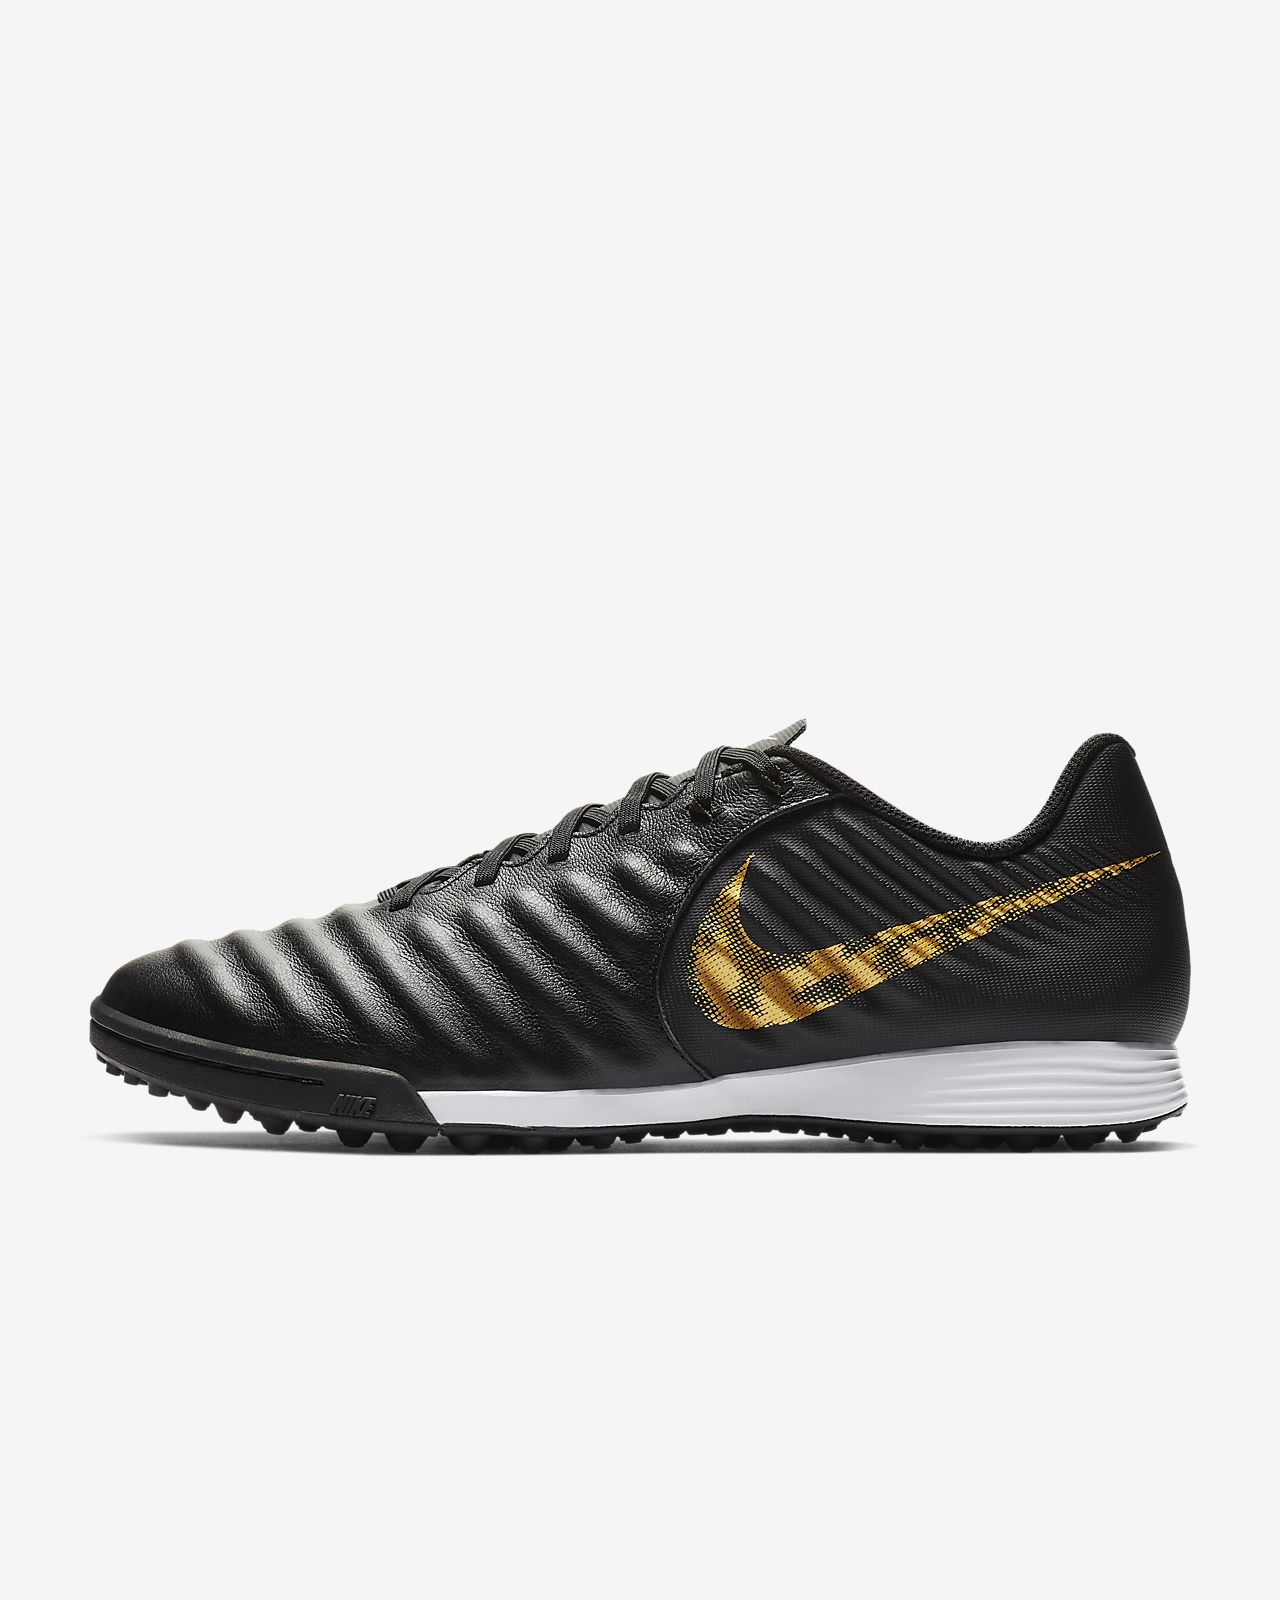 9771a855b8c91 Nike LegendX 7 Academy TF Artificial-Turf Football Boot. Nike.com GB